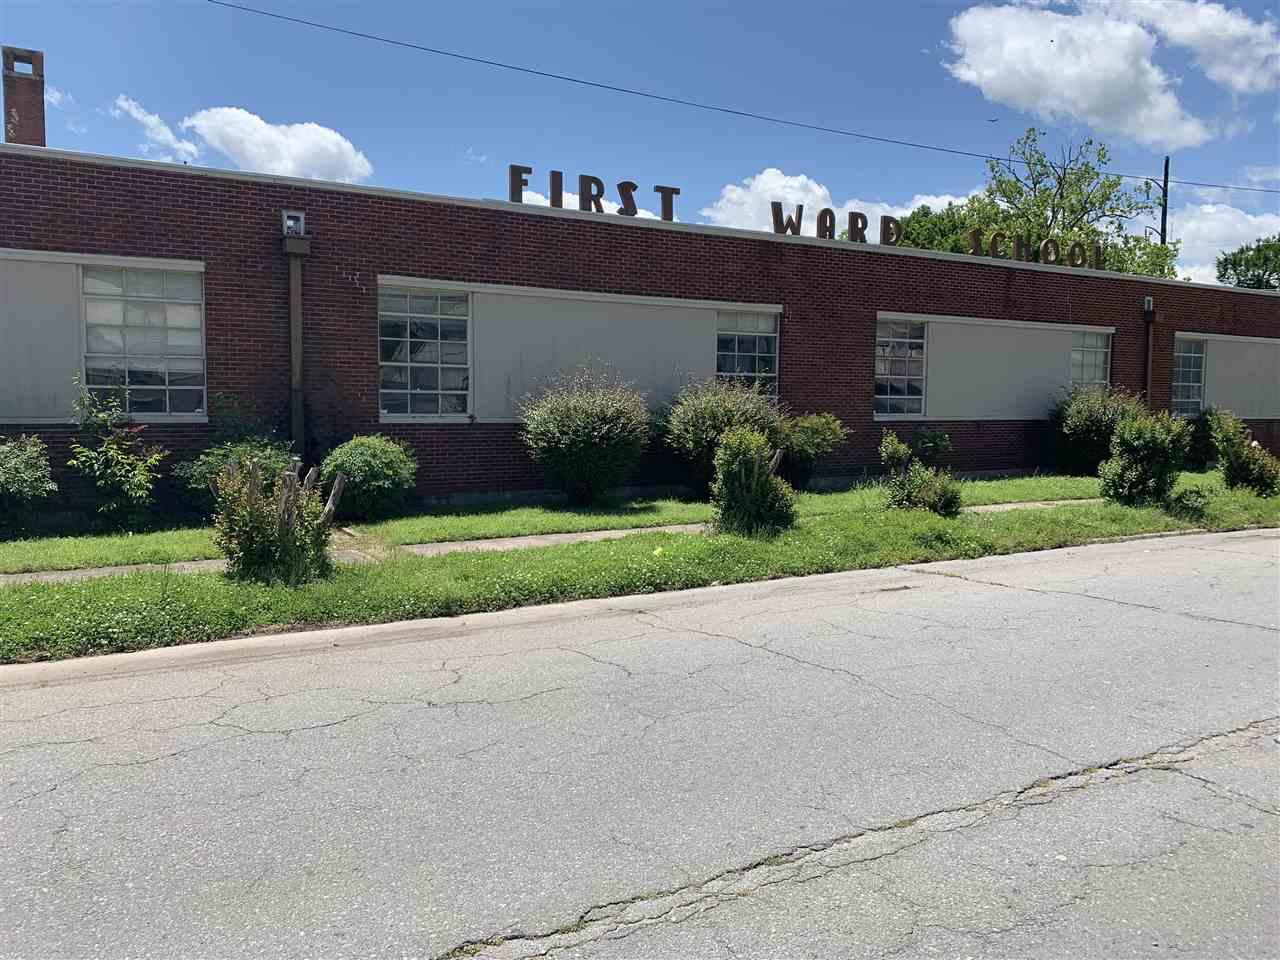 1300 E 5TH AVE FIRST WARD SCHOOL #No, Pine Bluff, AR 71603